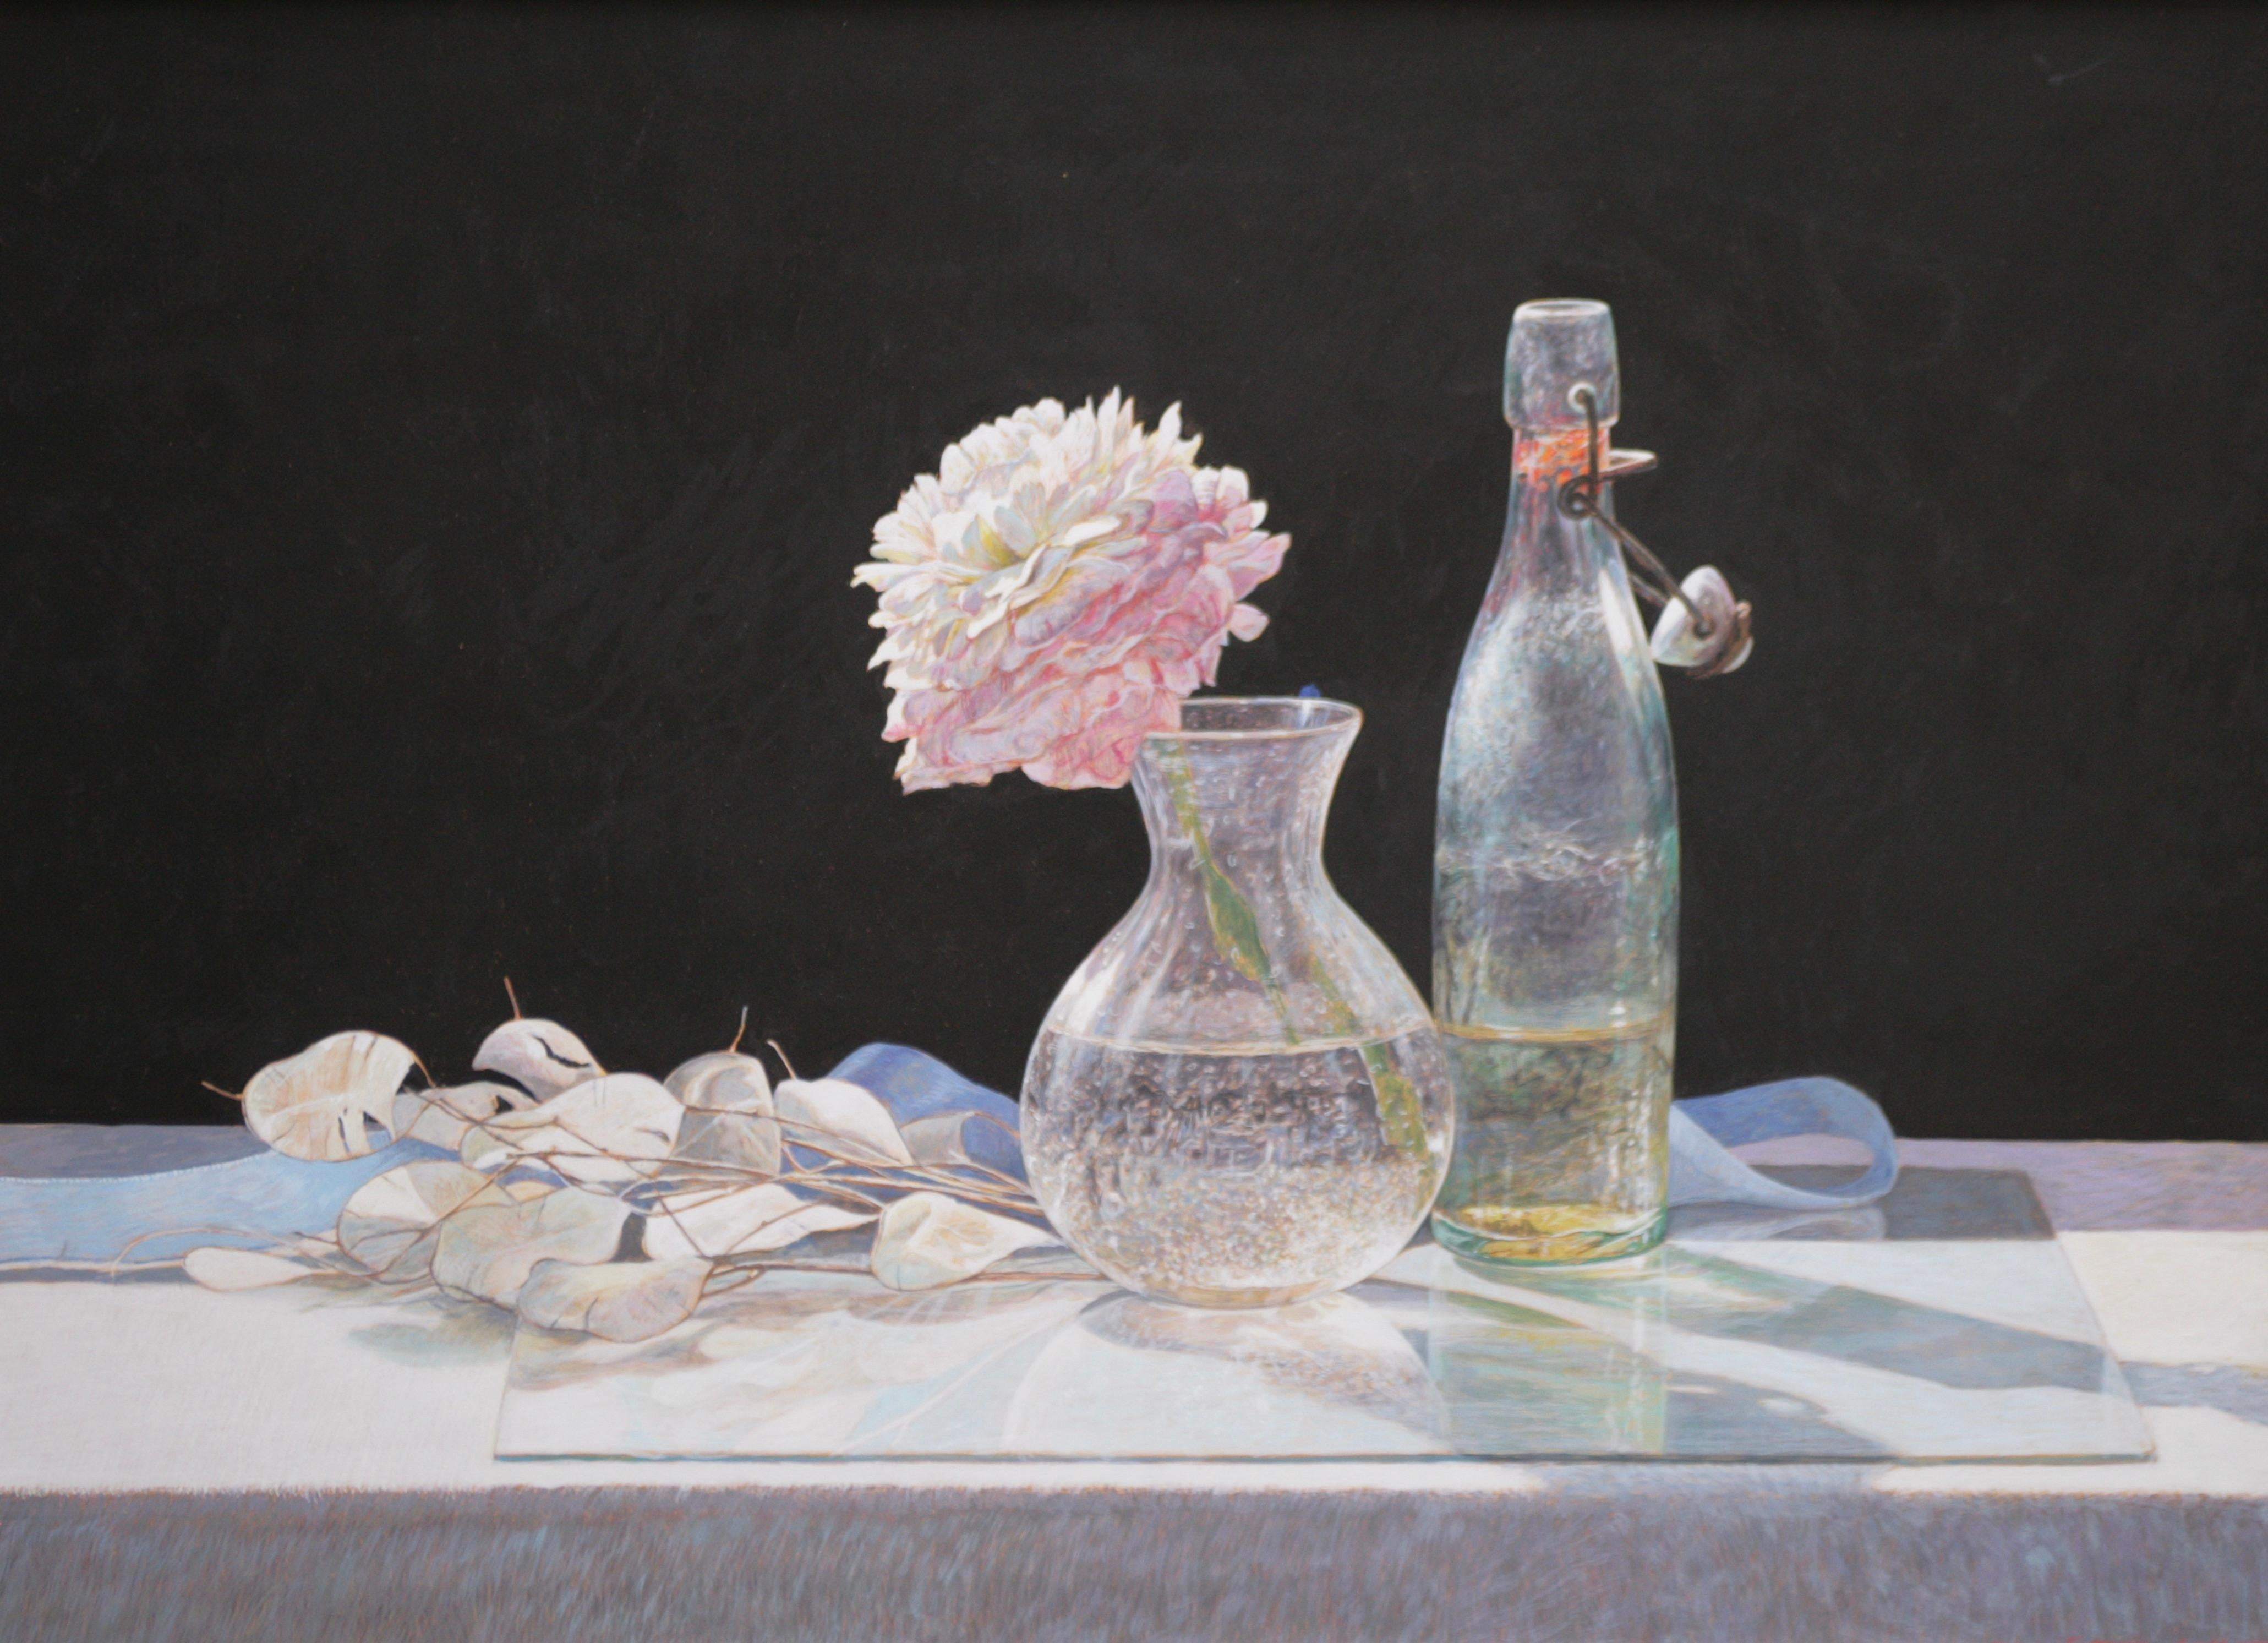 BLUE RIBBON COLIN FRASER CONTEMPORARY SCOTTISH ARTIST